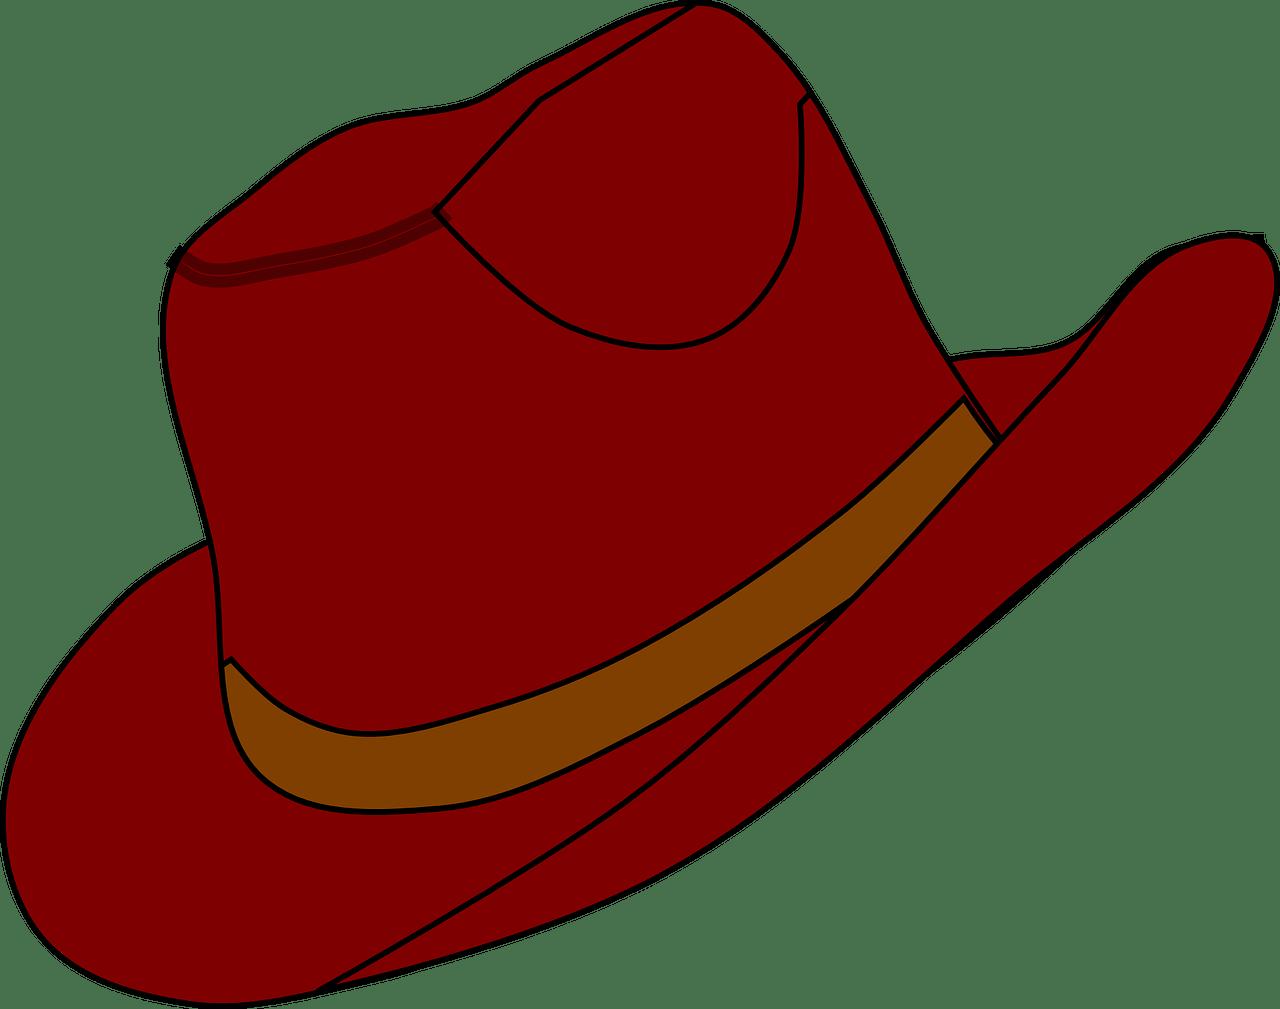 hight resolution of cowboy hat clipart free danaspaj top